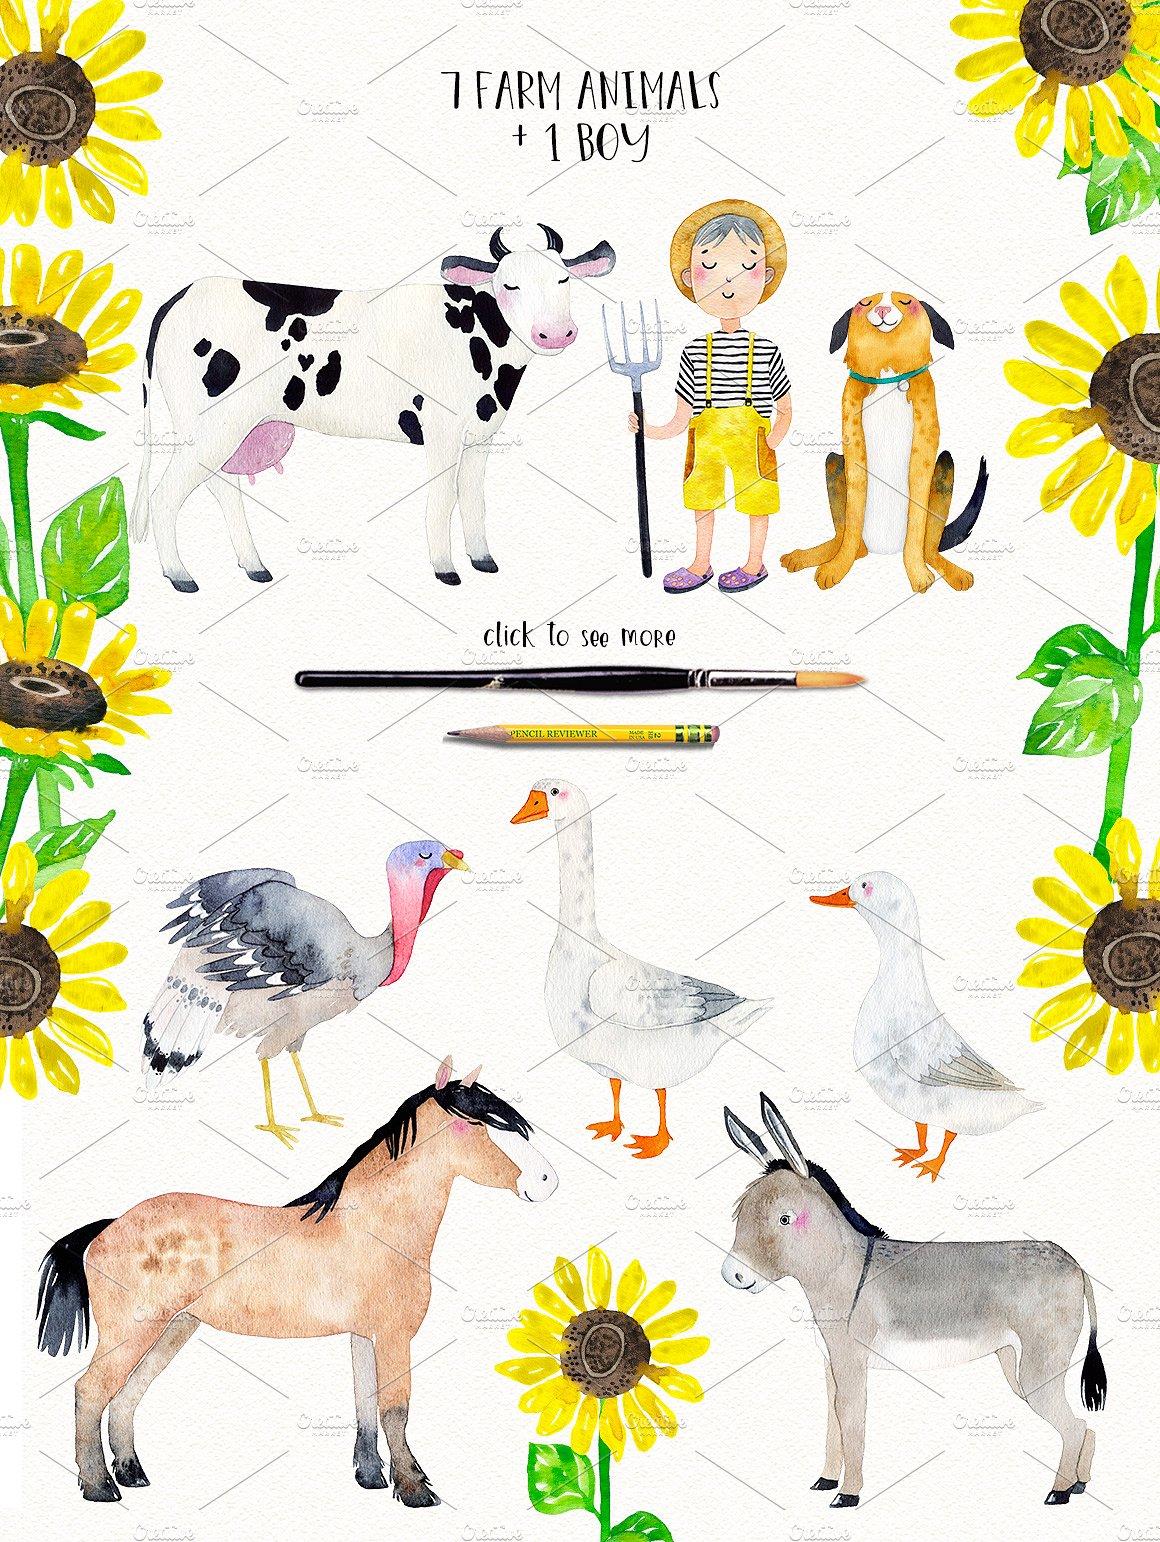 FARM ANIMALS watercolor set PART 2 example image 7